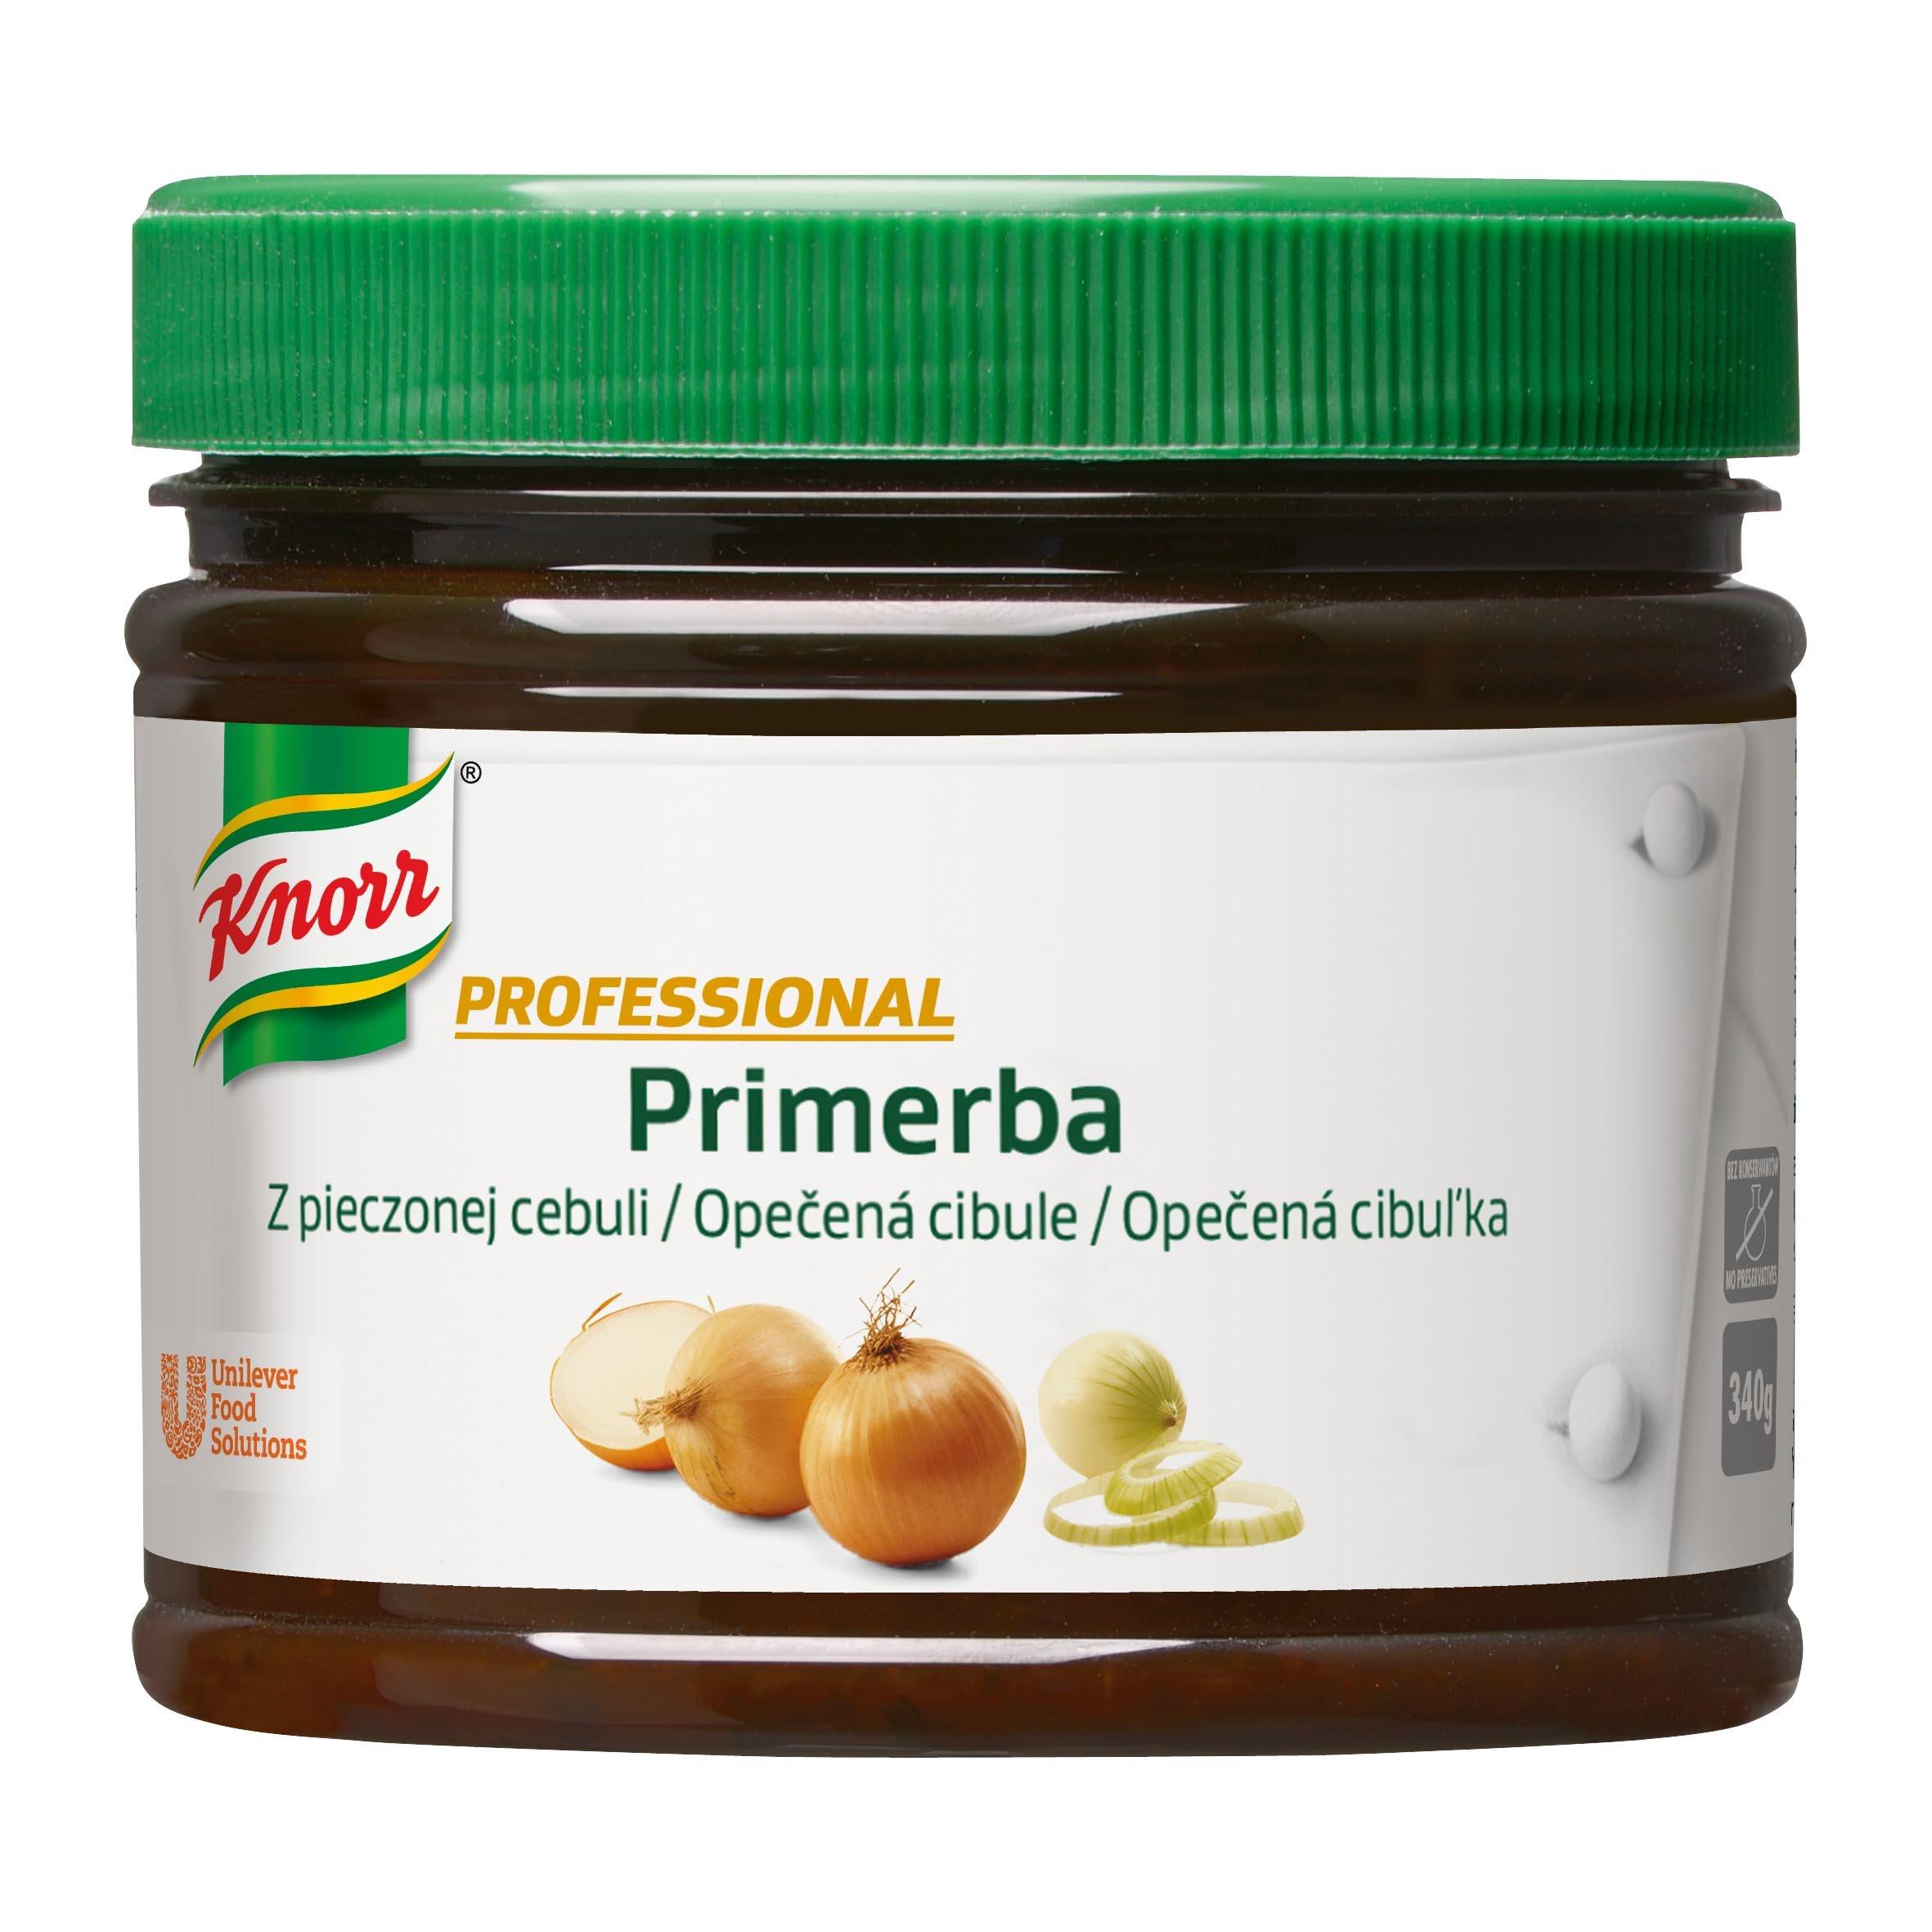 Knorr Professional Primerba Opečená cibule 0,34 kg